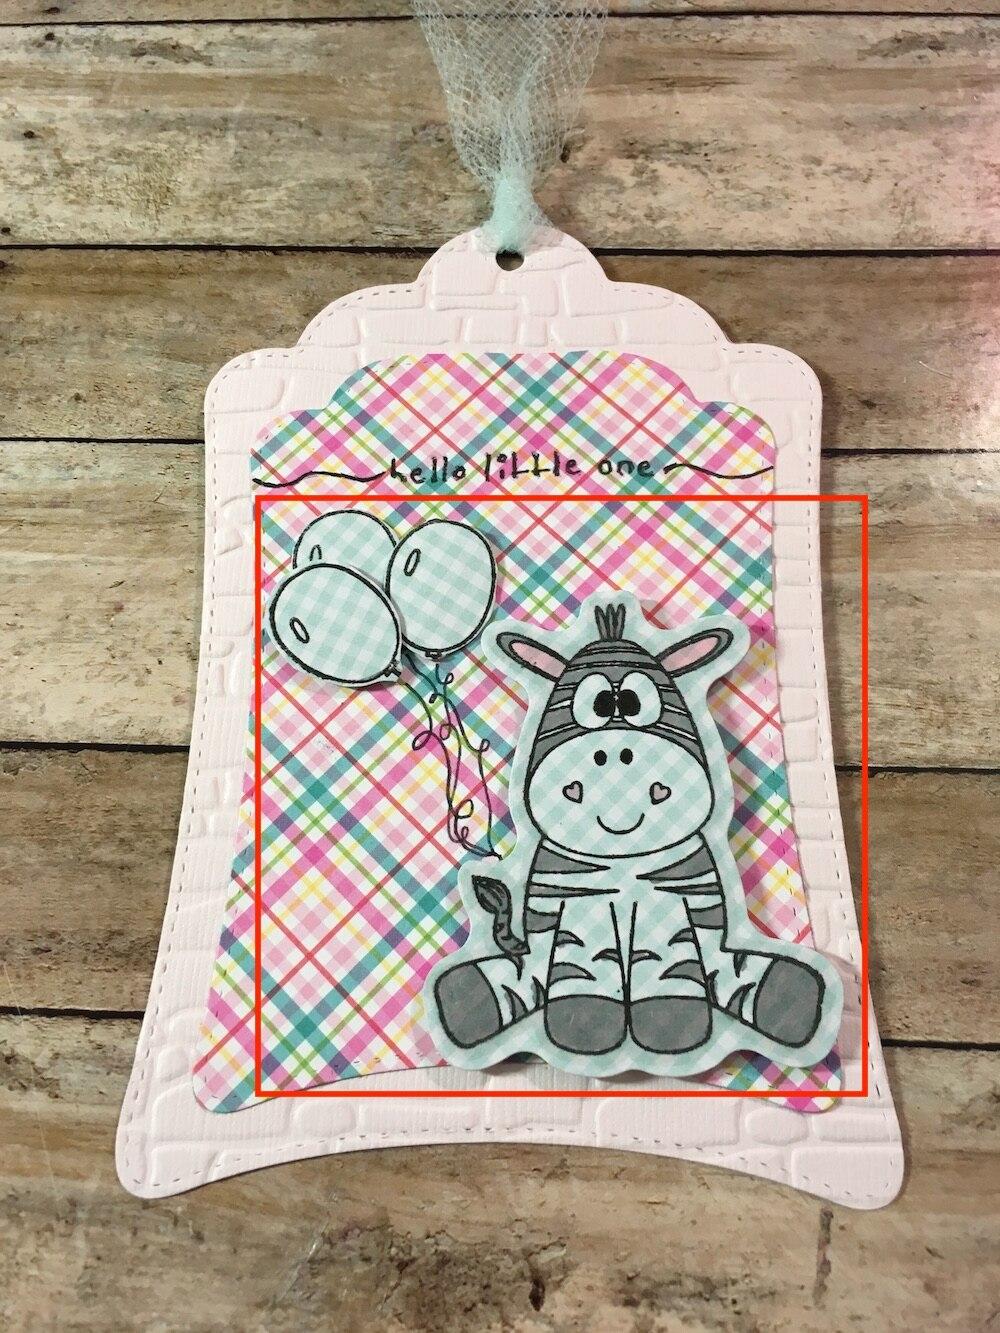 Baby Hands and Feet Metal Cut Cutting Dies Mold Tool for Handmade Diy Craft Scrapbooking//Card Making//Kids Fun Decoration Supplies